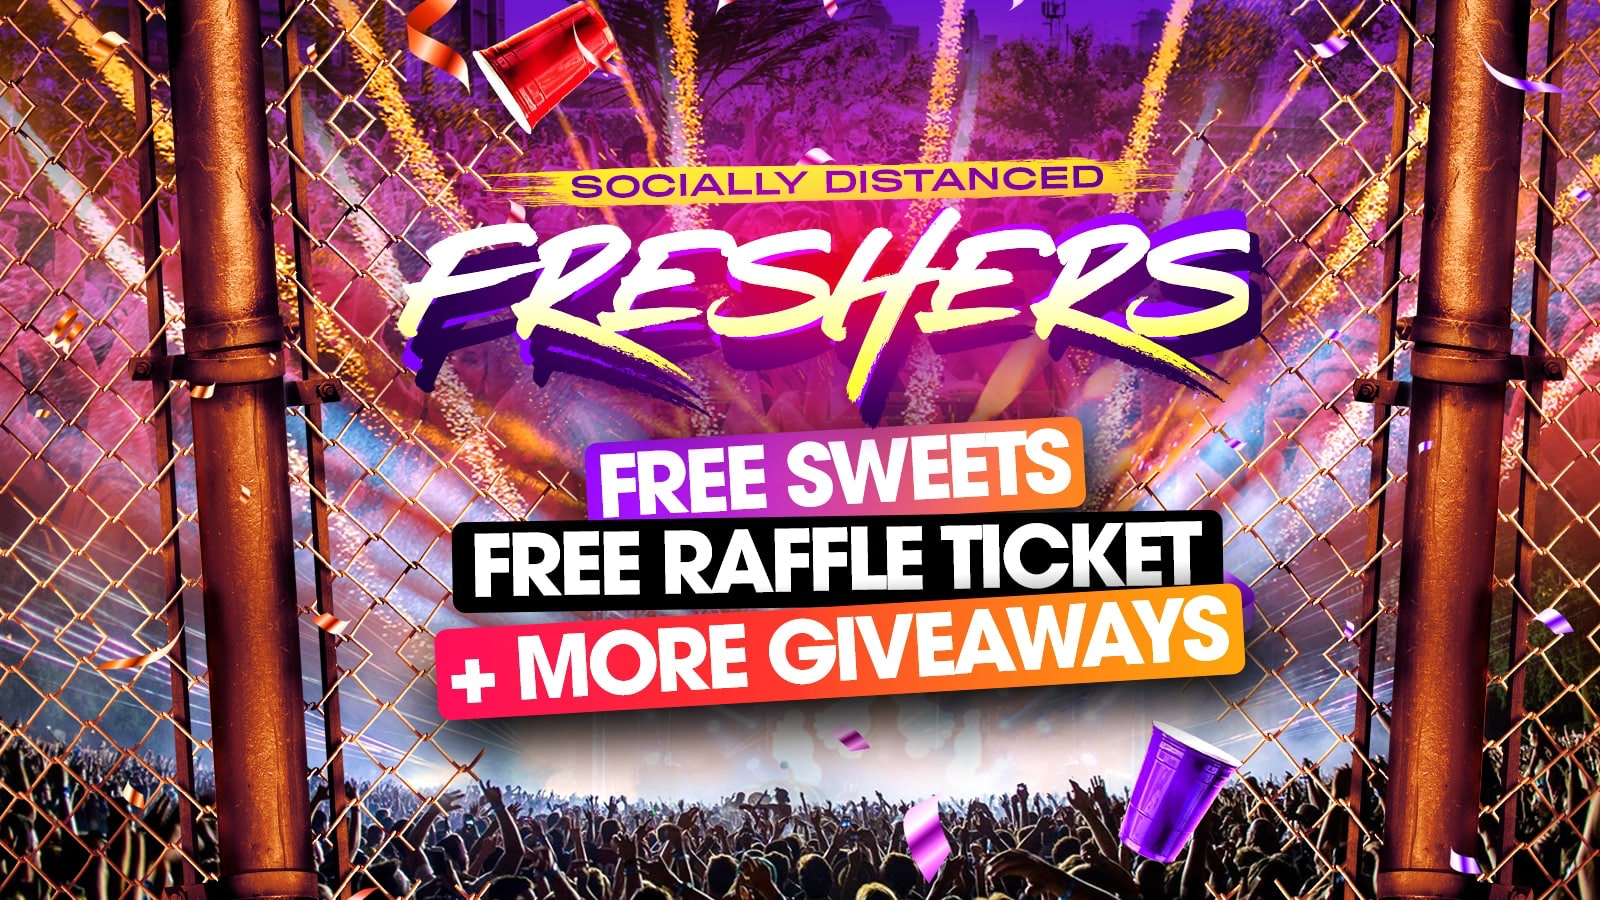 Socially Distanced Freshers // Brighton Freshers 2020